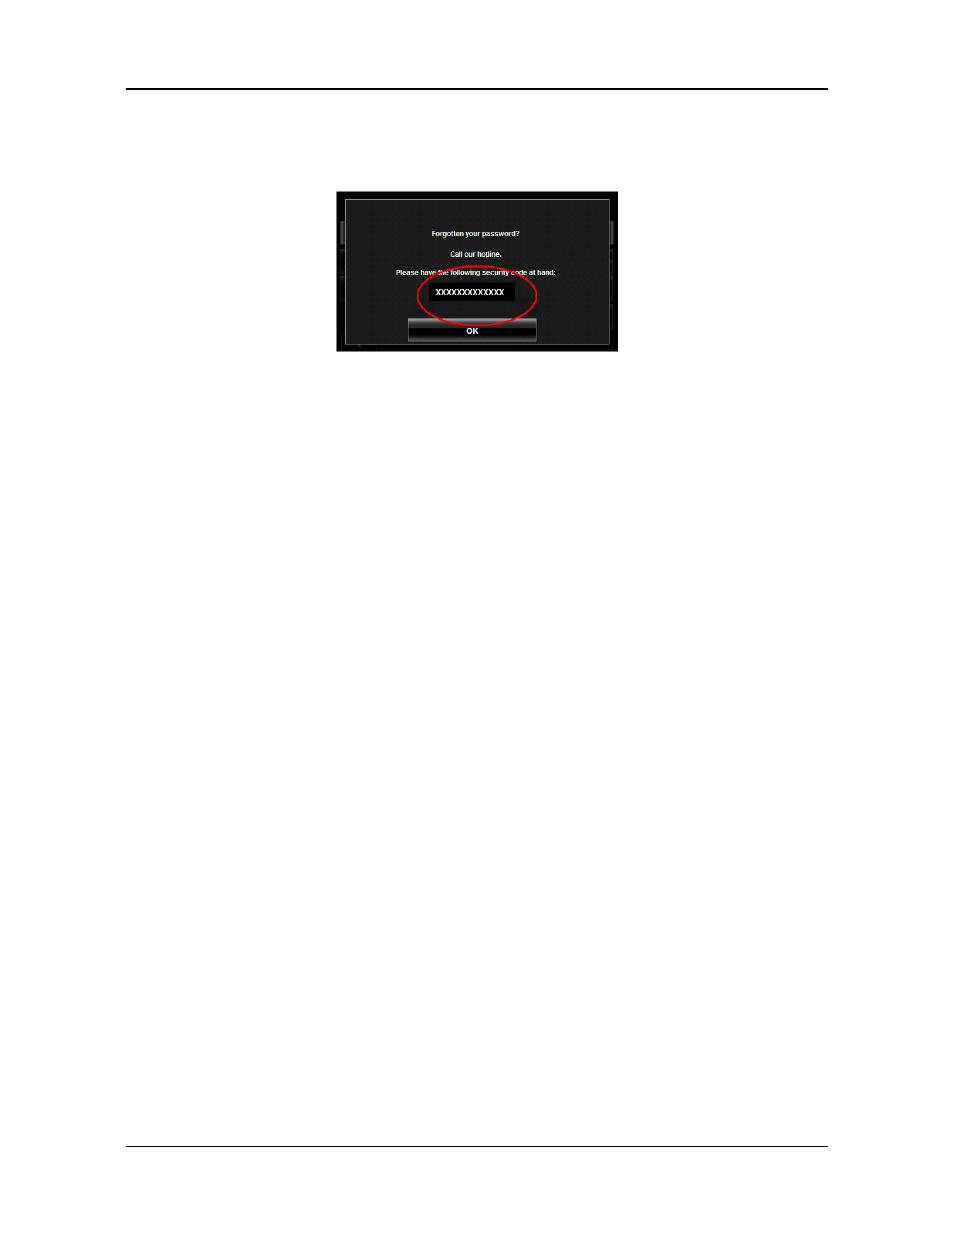 forgotten your password navigon pna 2100 max user manual page 49 rh manualsdir com NAVIGON 5110 Navigon 2100 GPS Car Charger